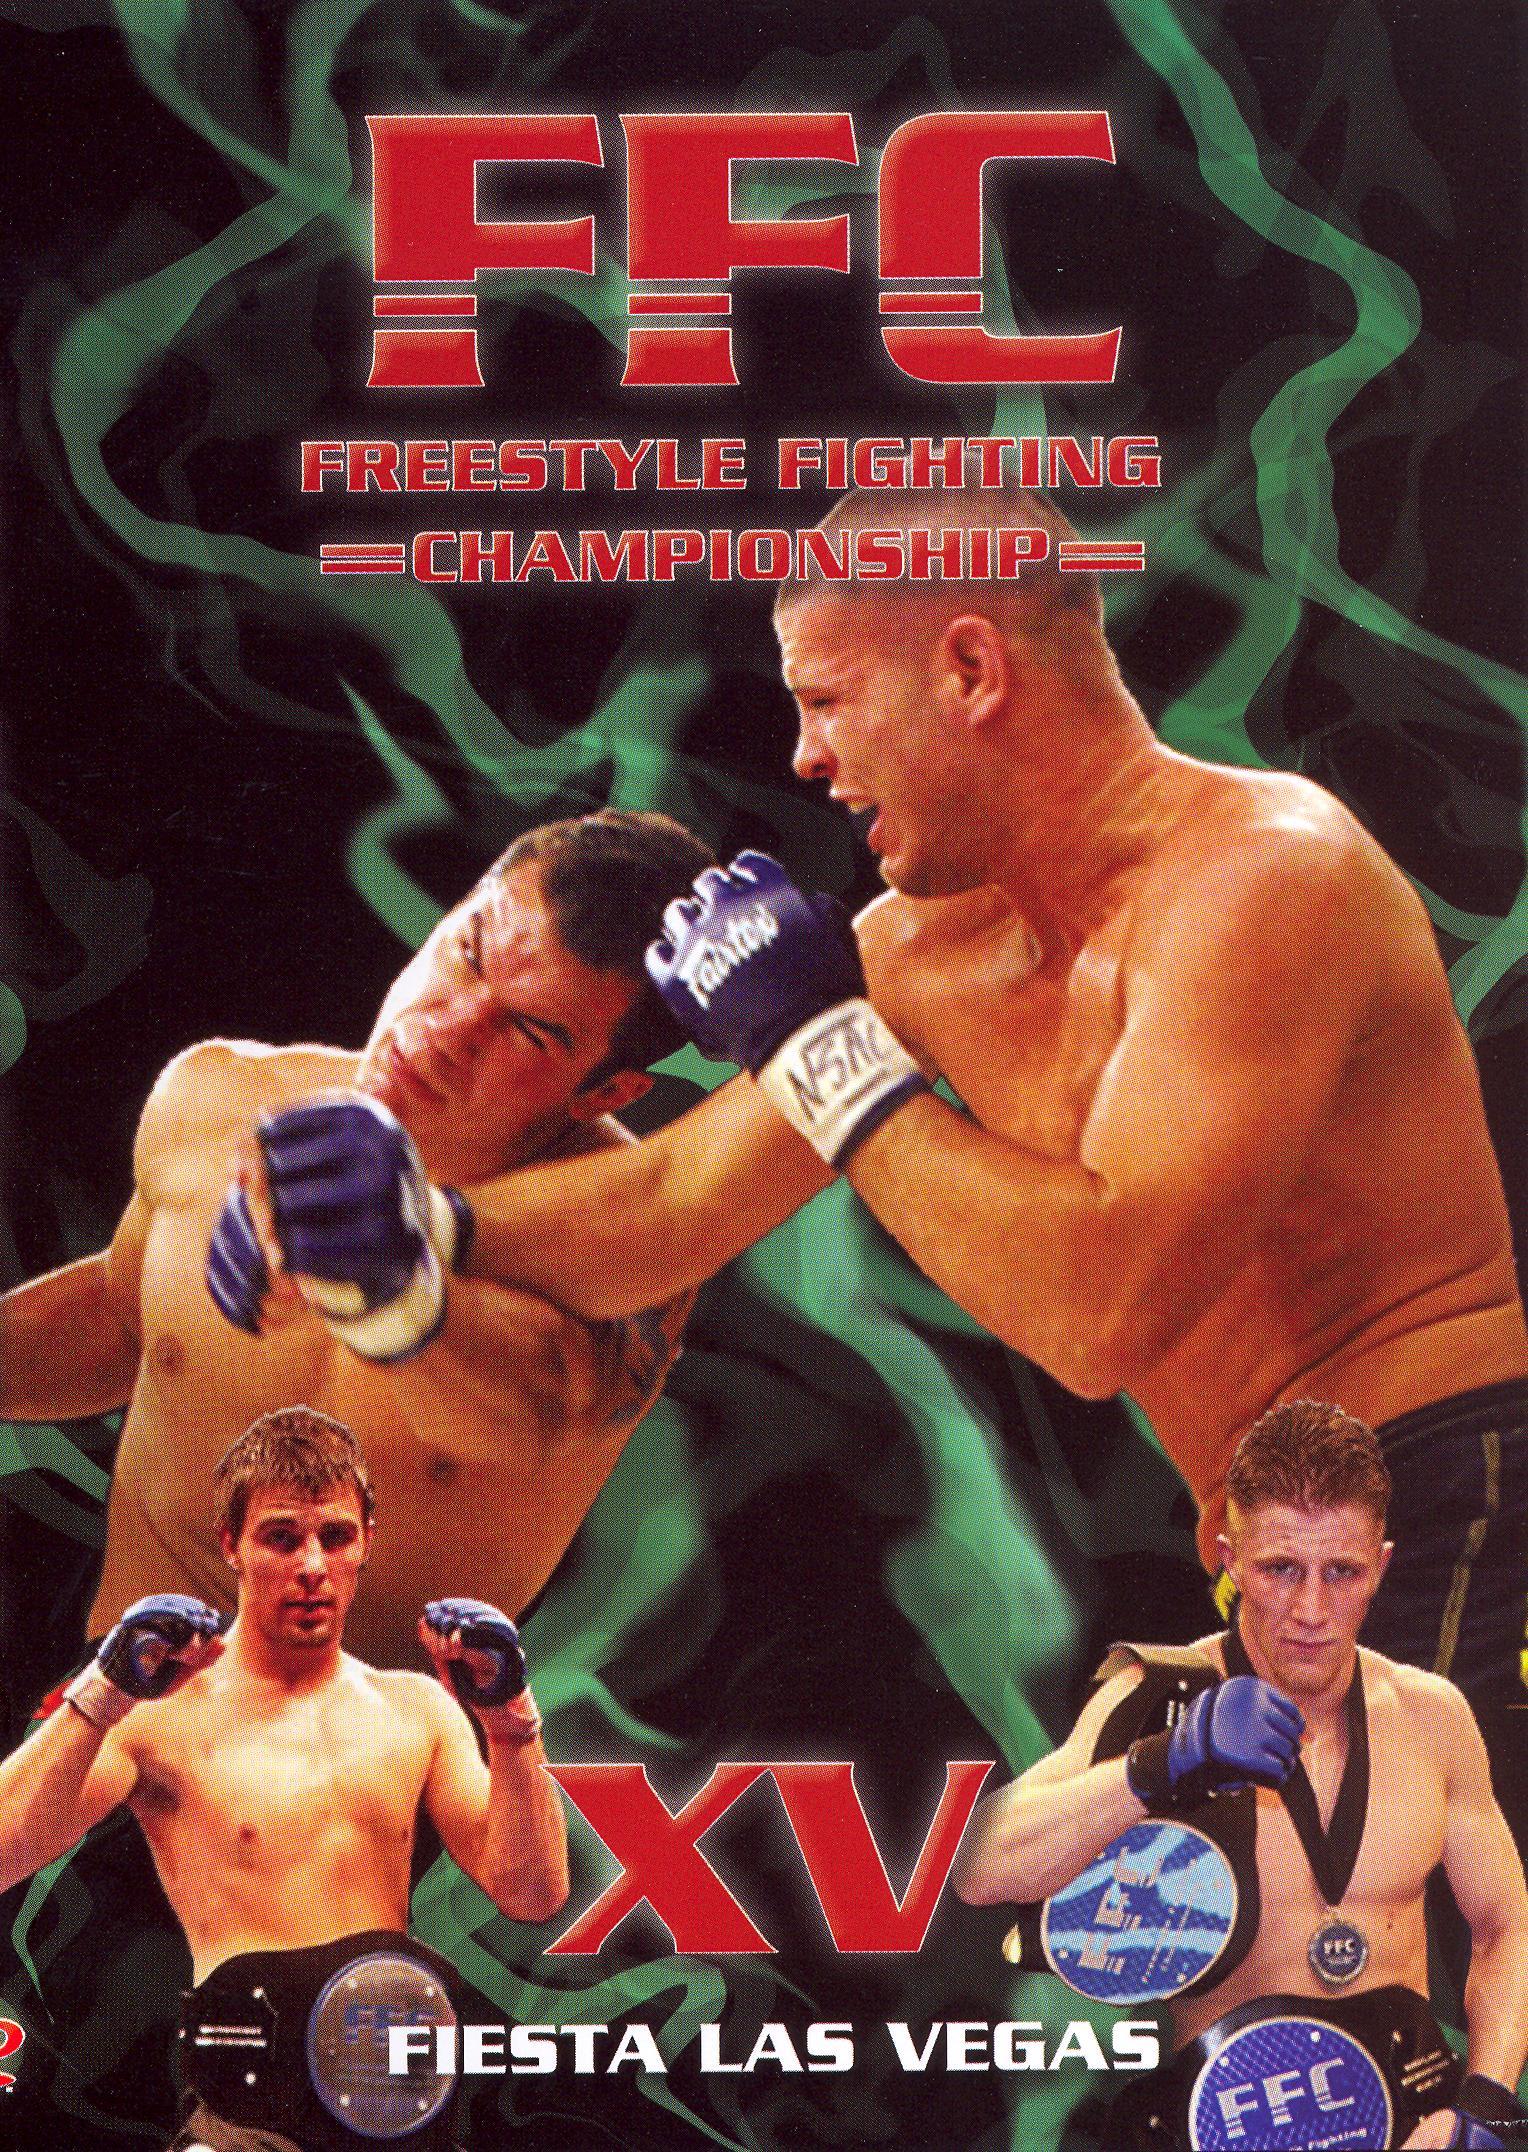 Freestyle Fighting Championship, Vol. 15: Fiesta Las Vegas